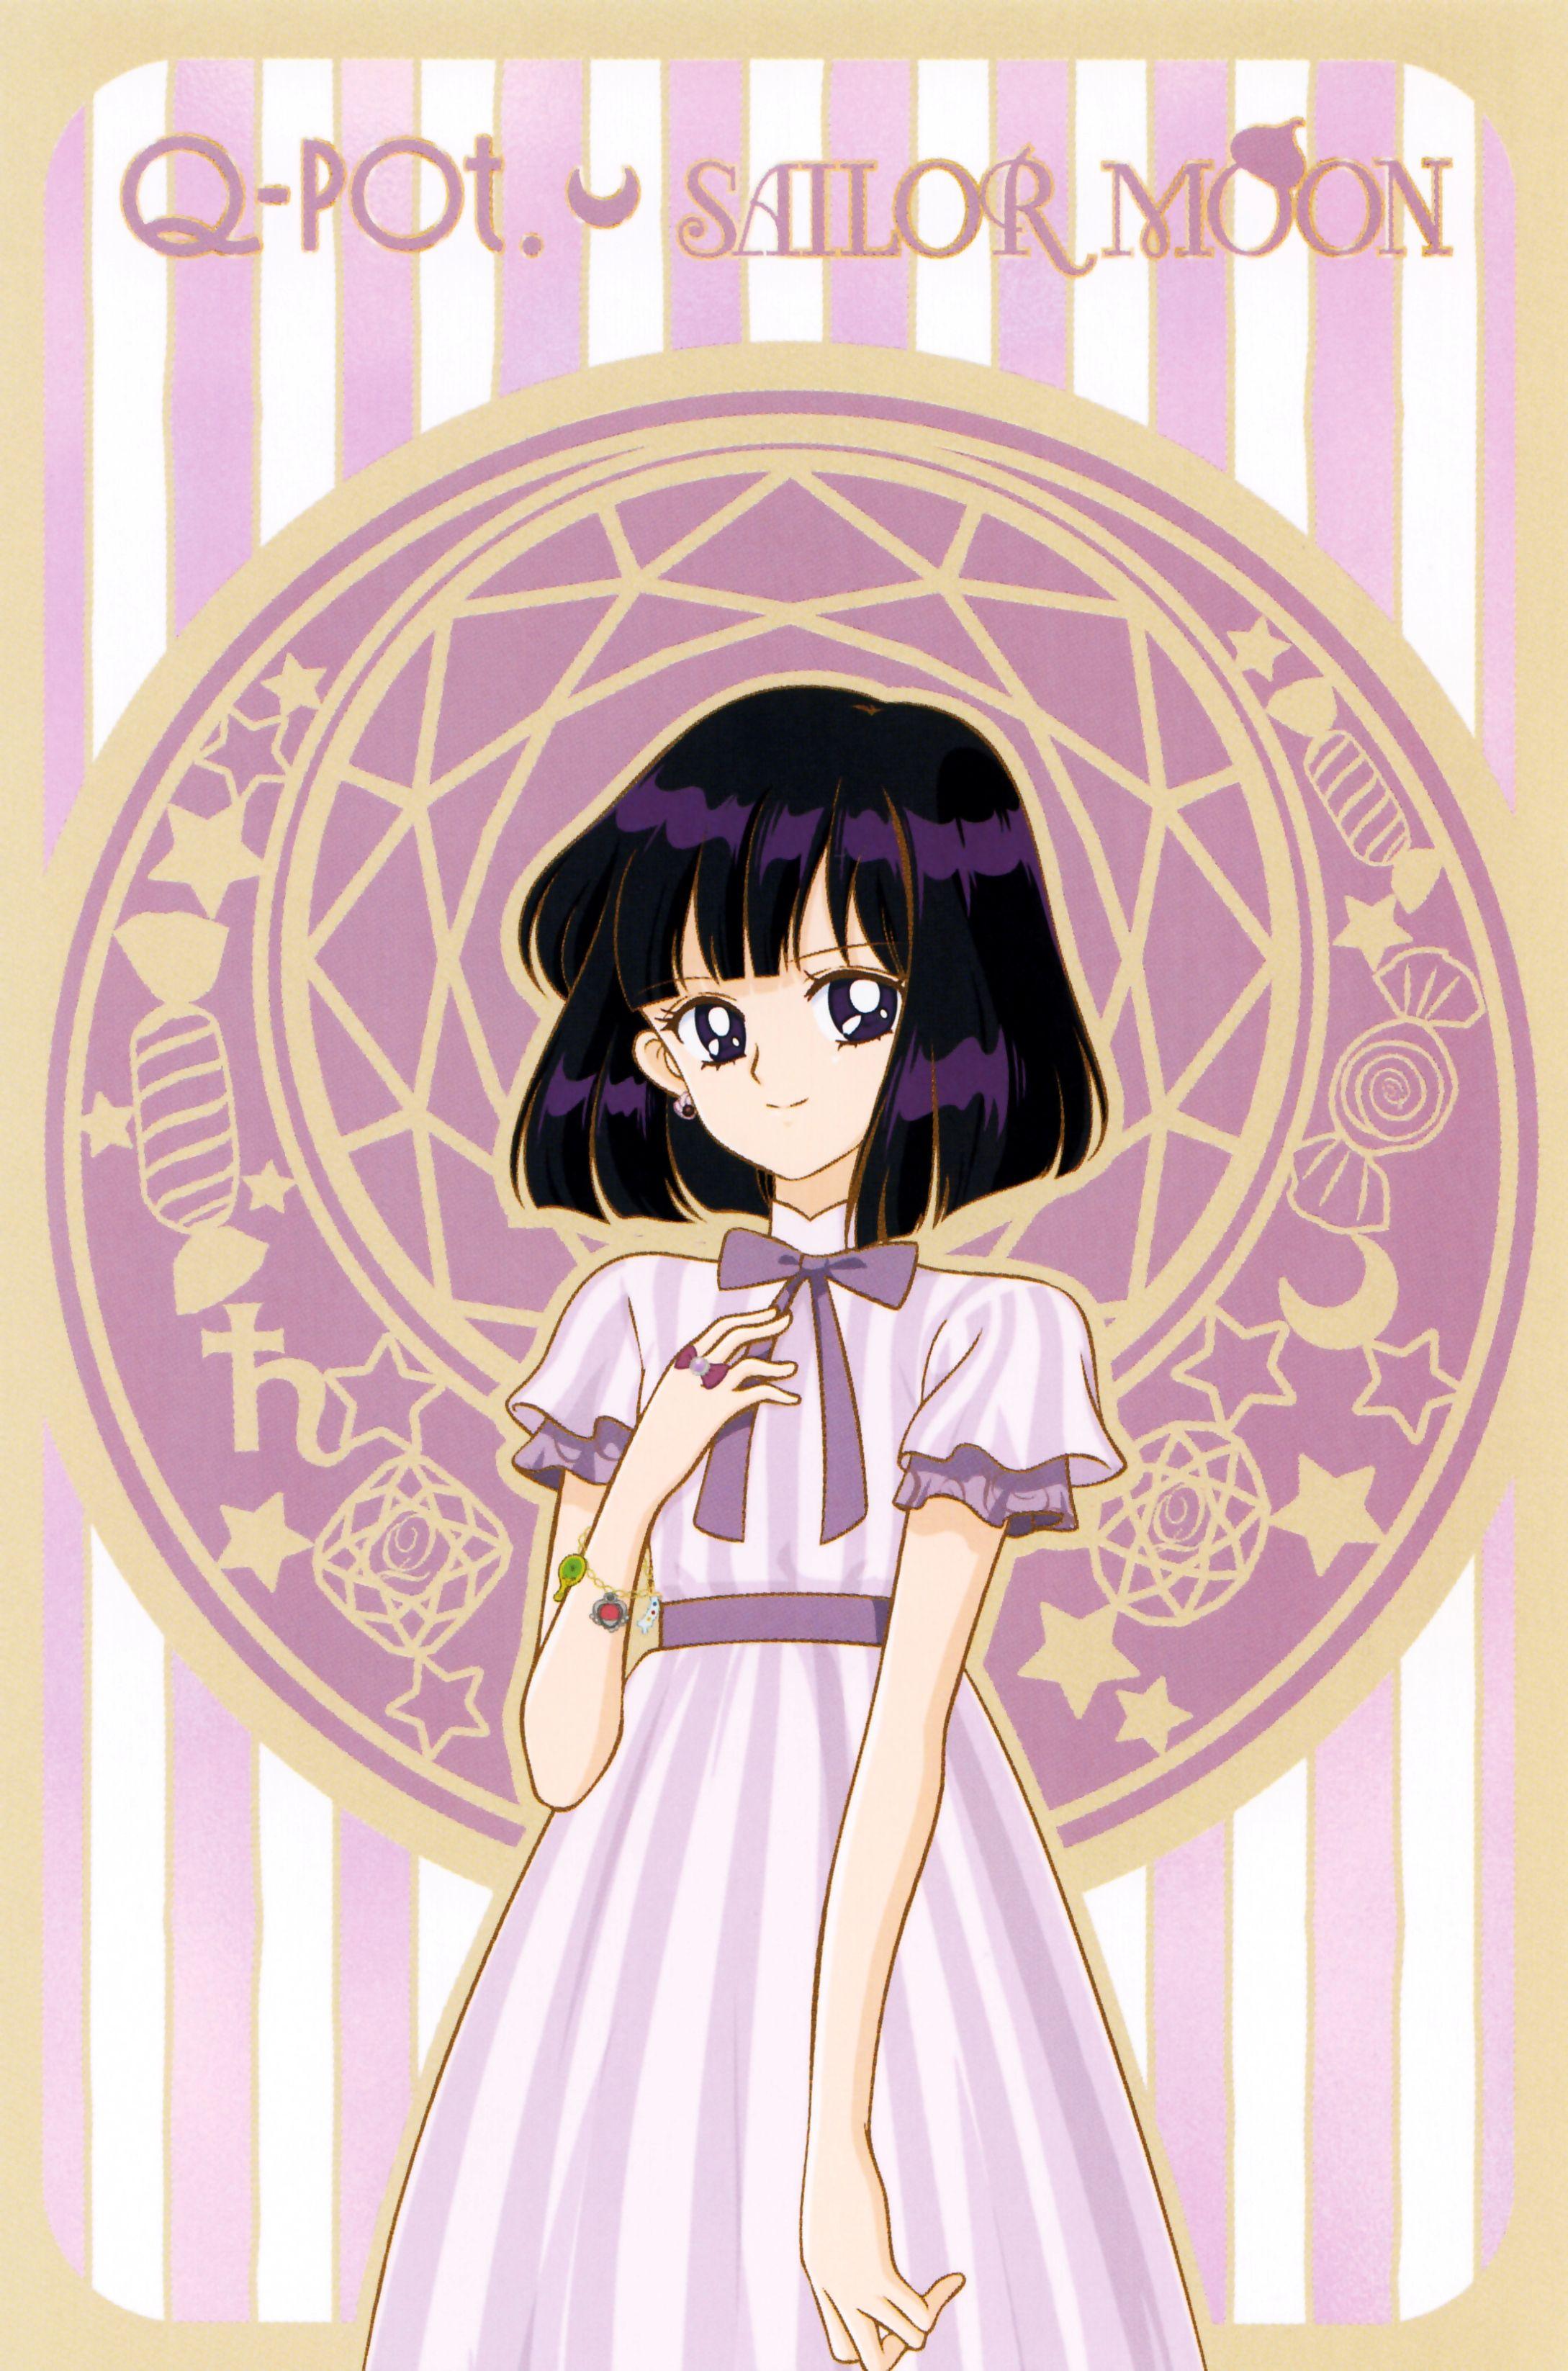 20x20 20   Sailor moon art, Sailor moon manga, Sailor moon ...